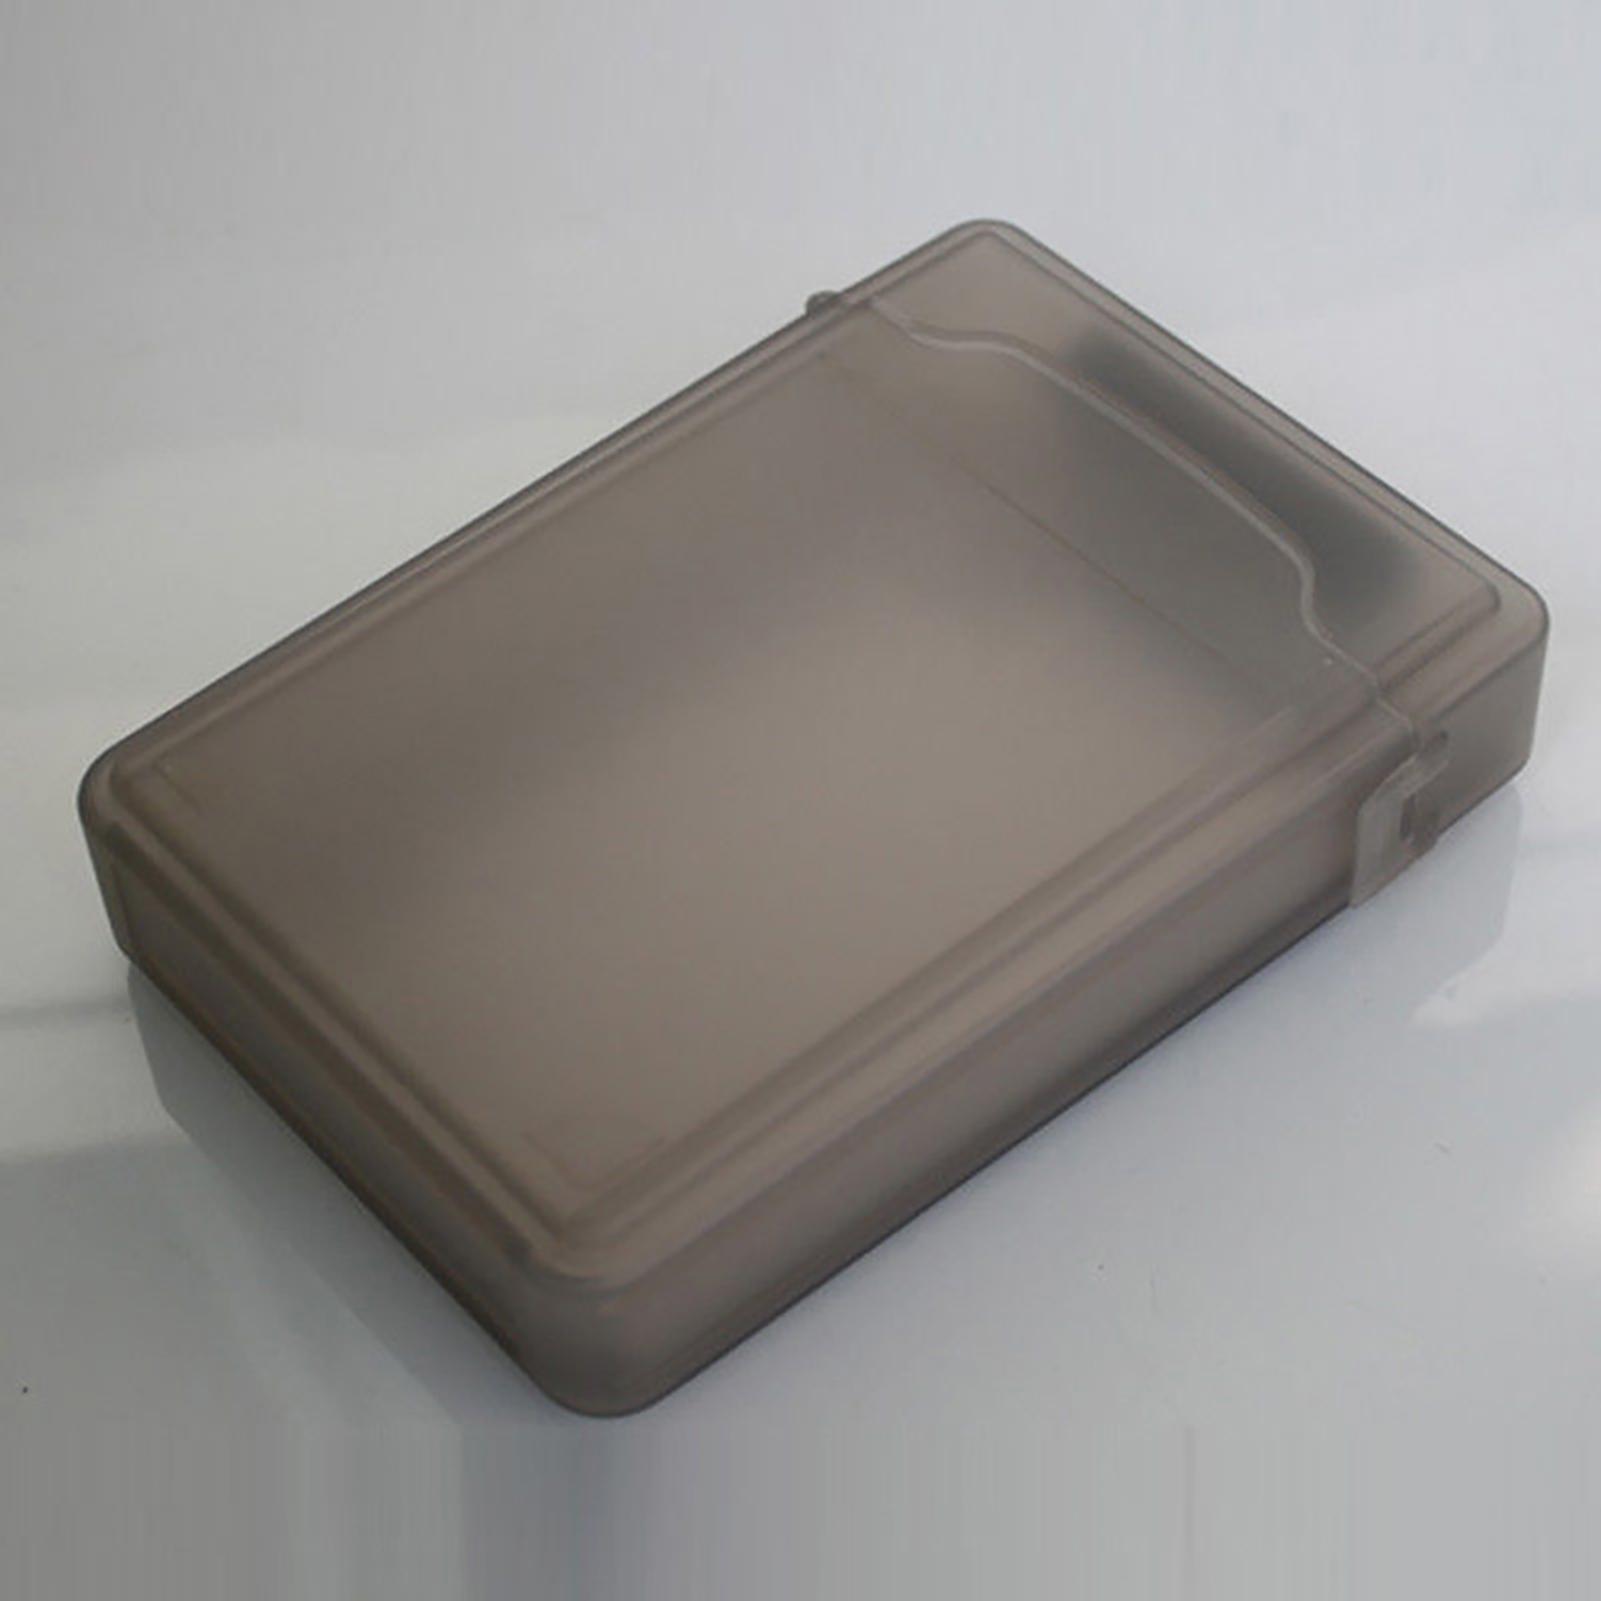 Protection-Plastic-Storage-Box-Case-Enclosure-for-3-5-039-039-SATA-HDD-Hard-Drive-Disk thumbnail 7